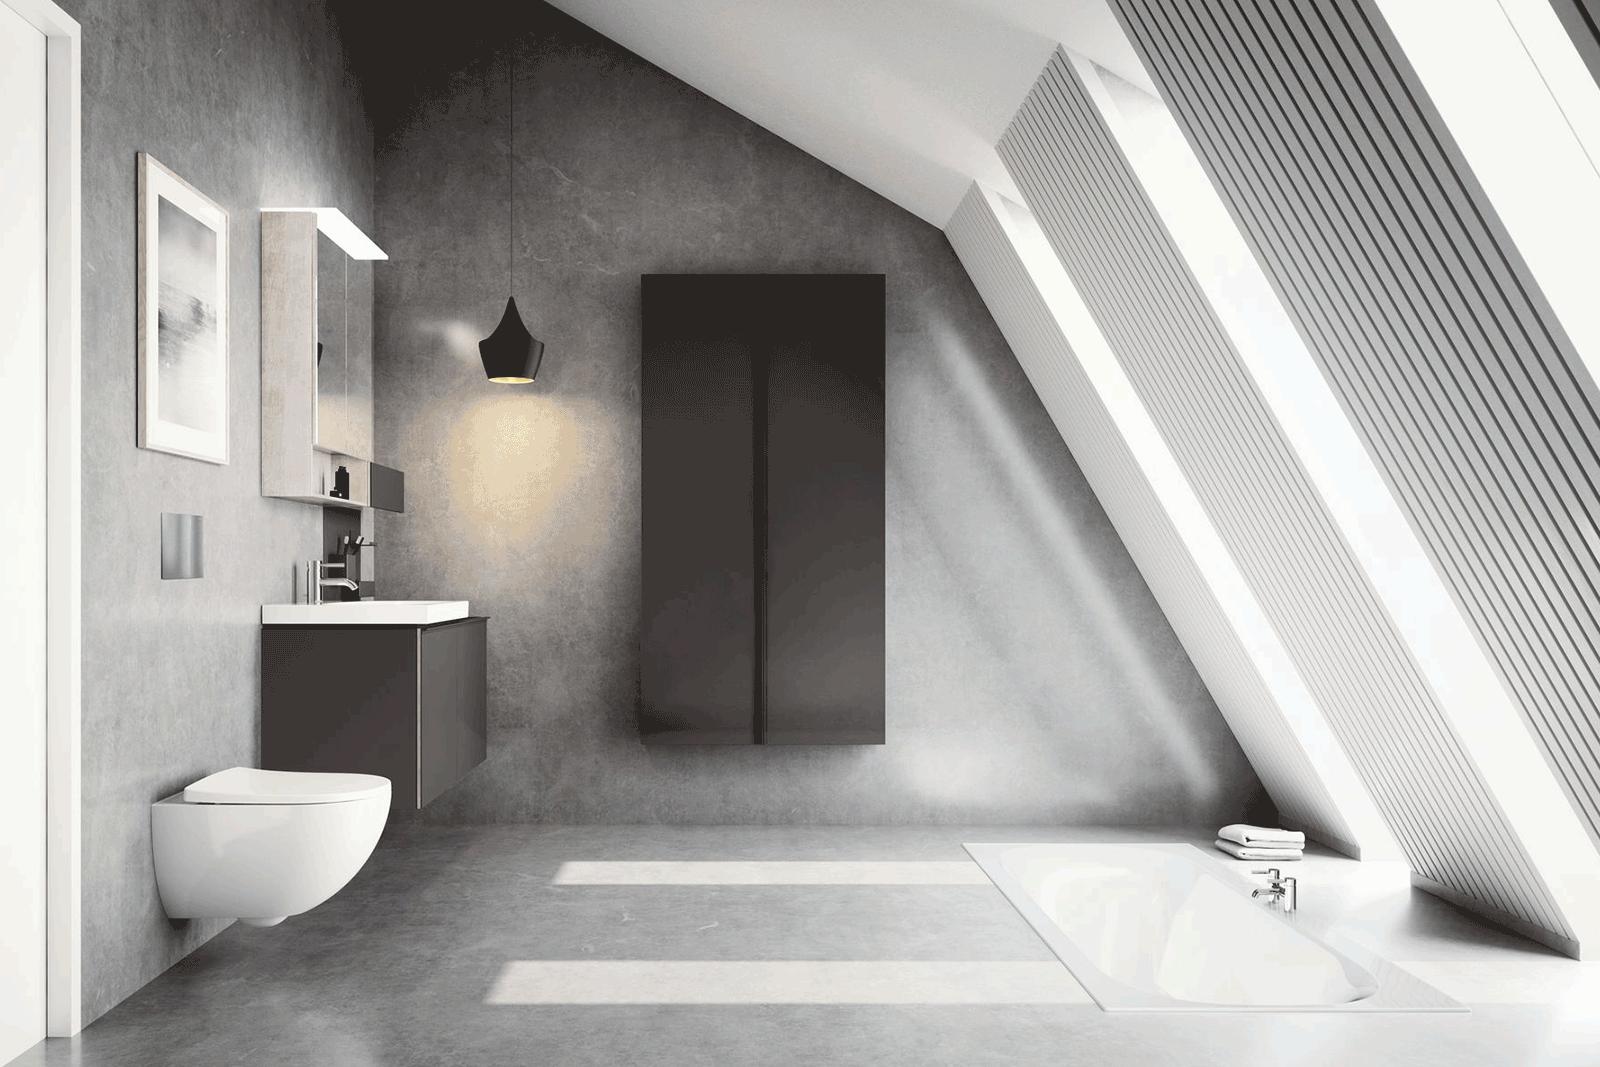 Geberit acanto small space bathroom